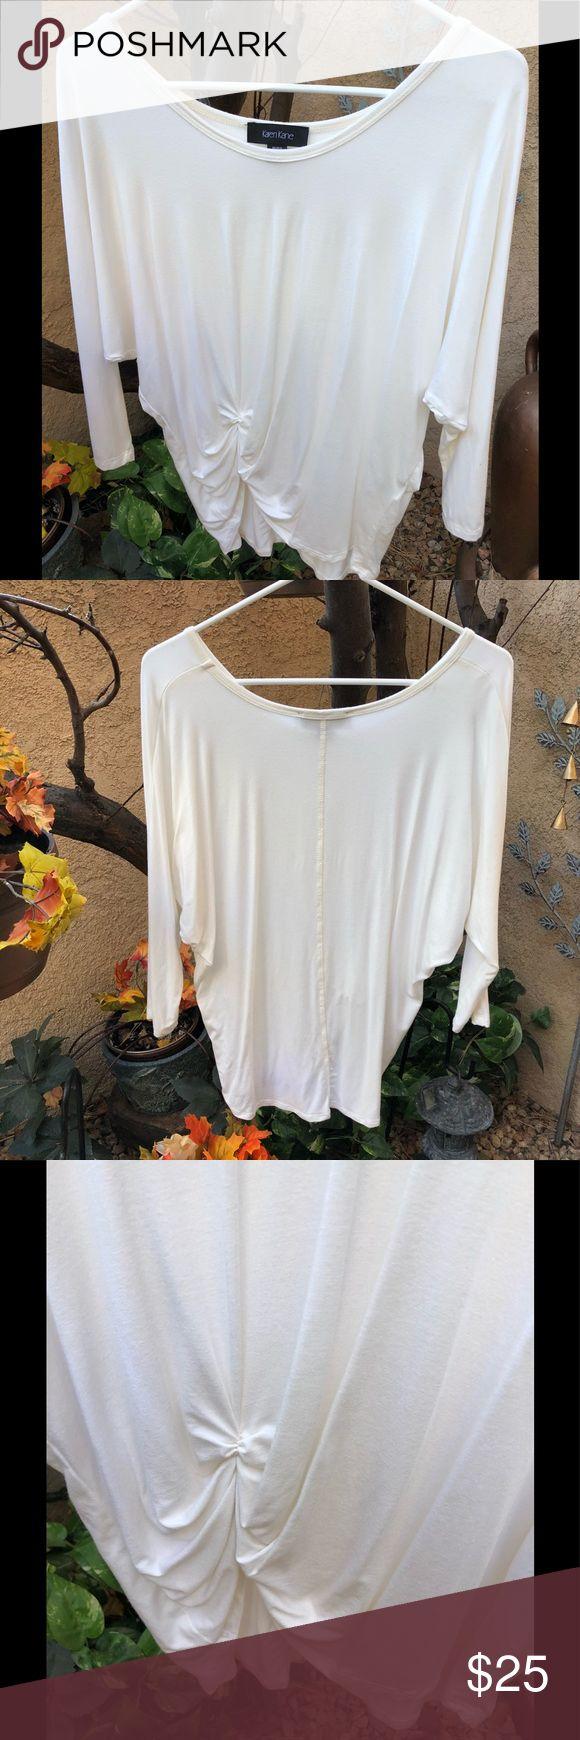 🎃New🎃Cute style, Karen Kane knit top! Sz sm🌹 Cream color, Karen Kane, three-quarter sleeve knit top. Gathering at right hip, raglan sleeve! Great condition👻 Karen Kane Tops